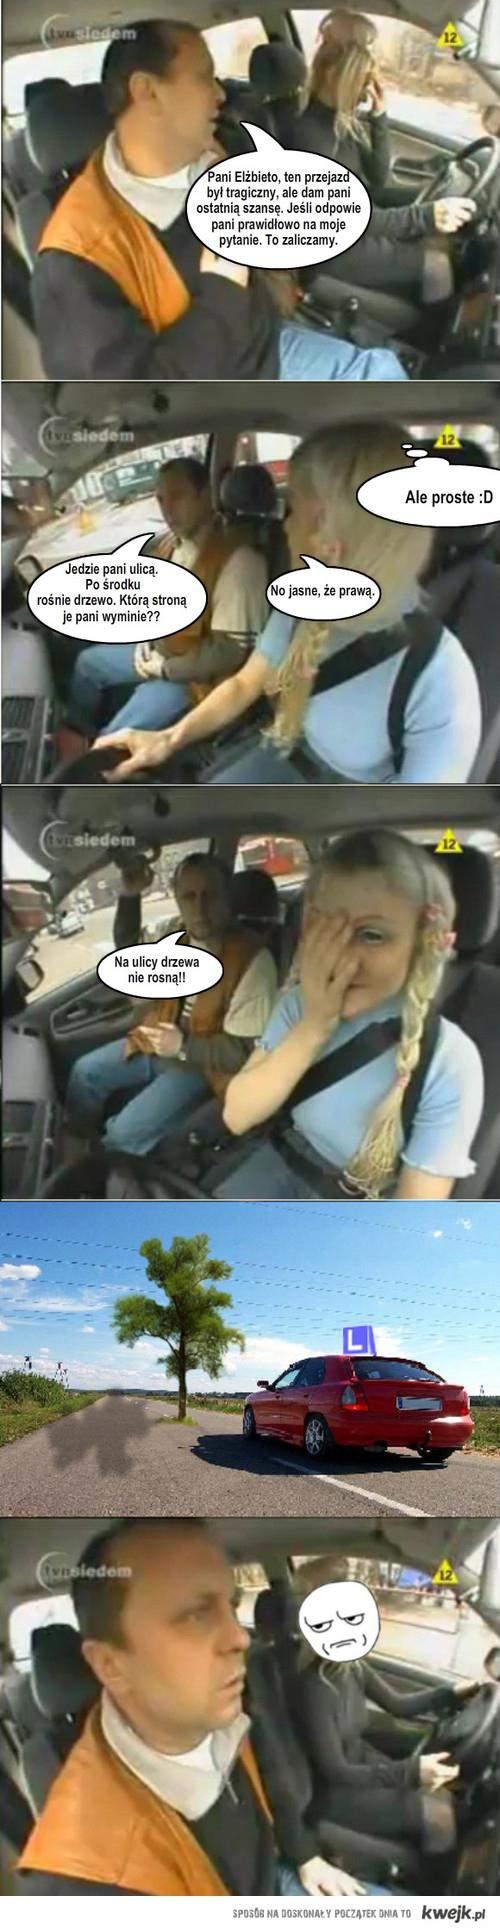 Blond driver